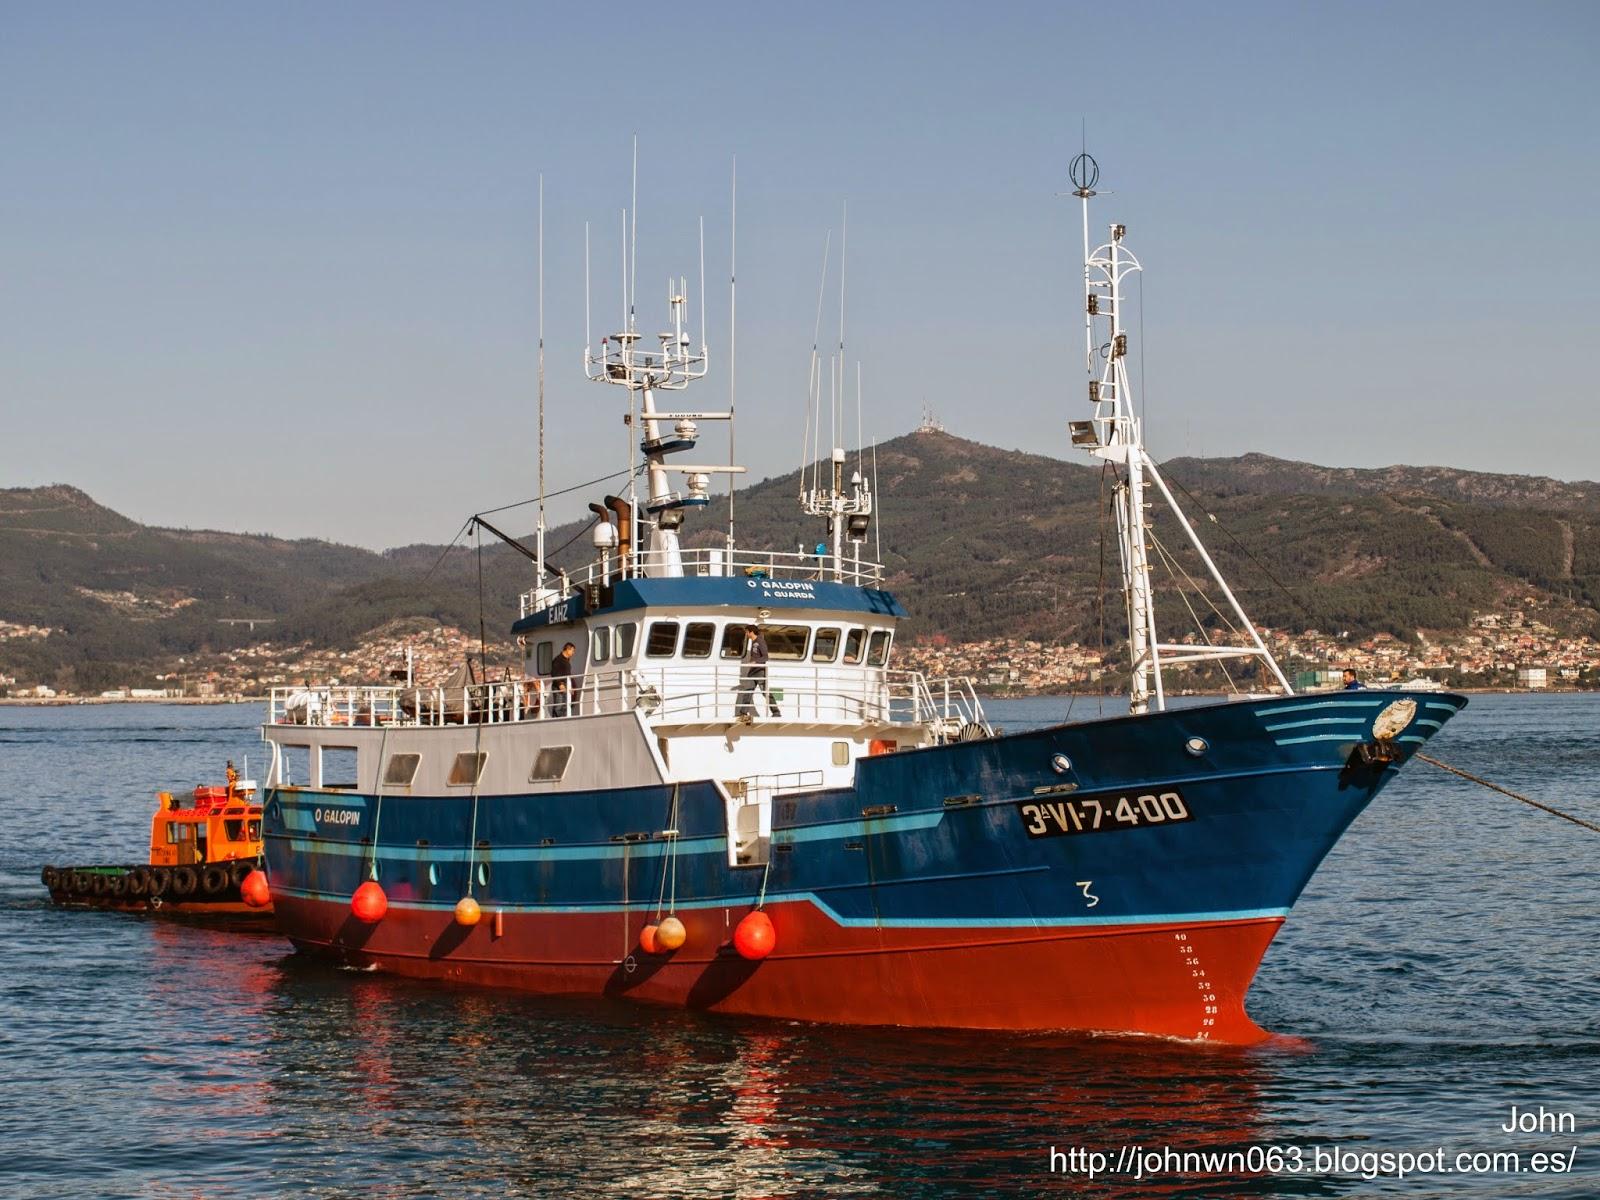 fotos de barcos, imagenes de barcos, o galopin, pesquero, espadero, a guarda, vigo